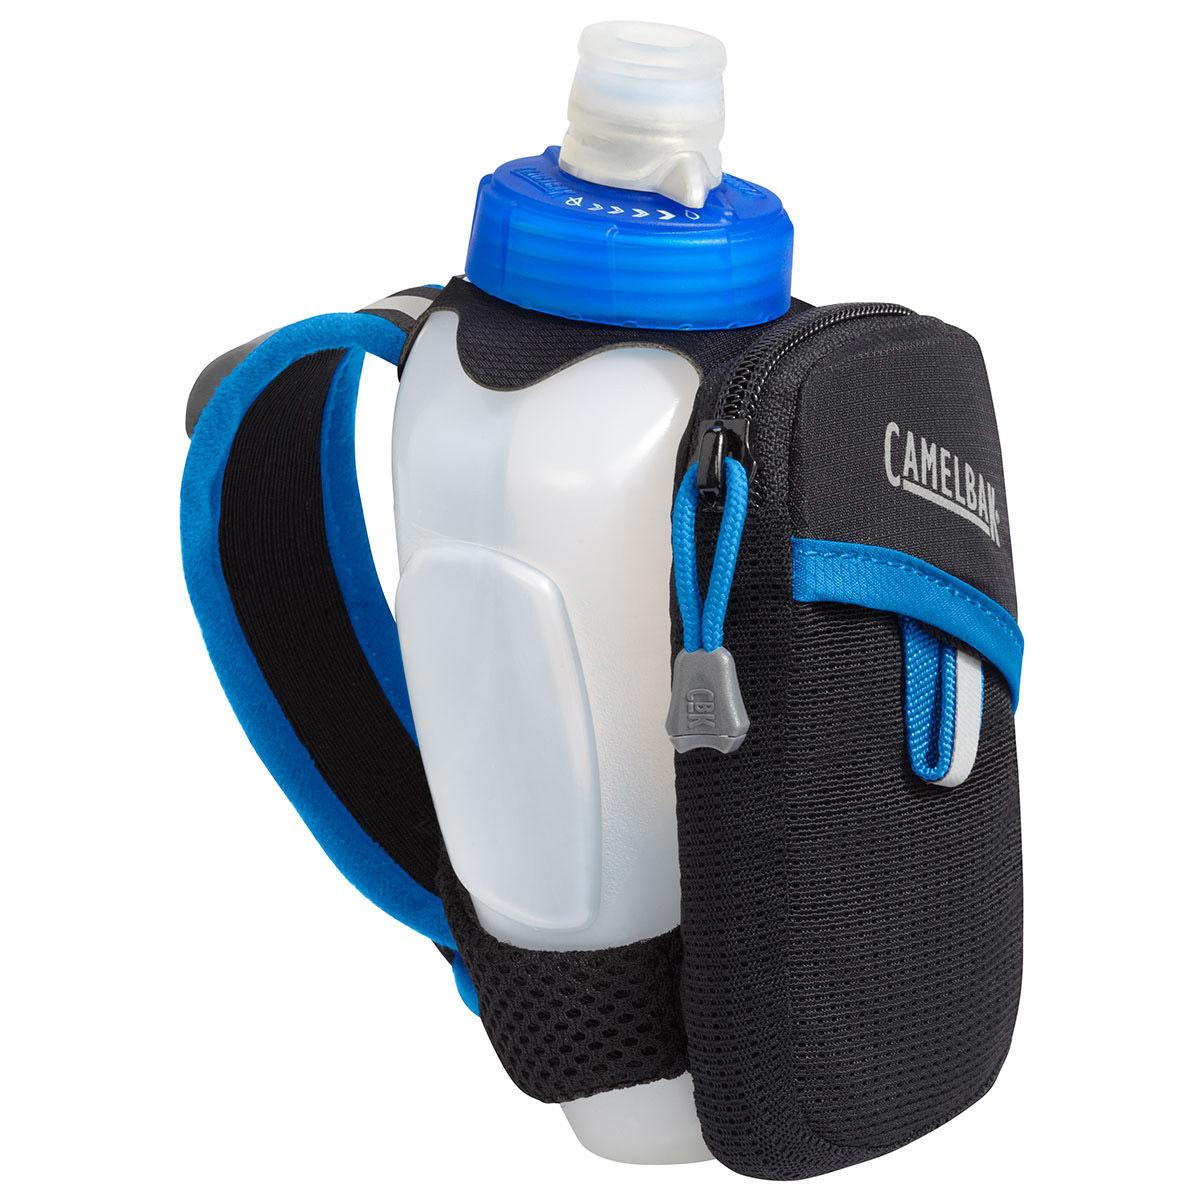 photo: CamelBak Arc Quick Grip Podium water bottle